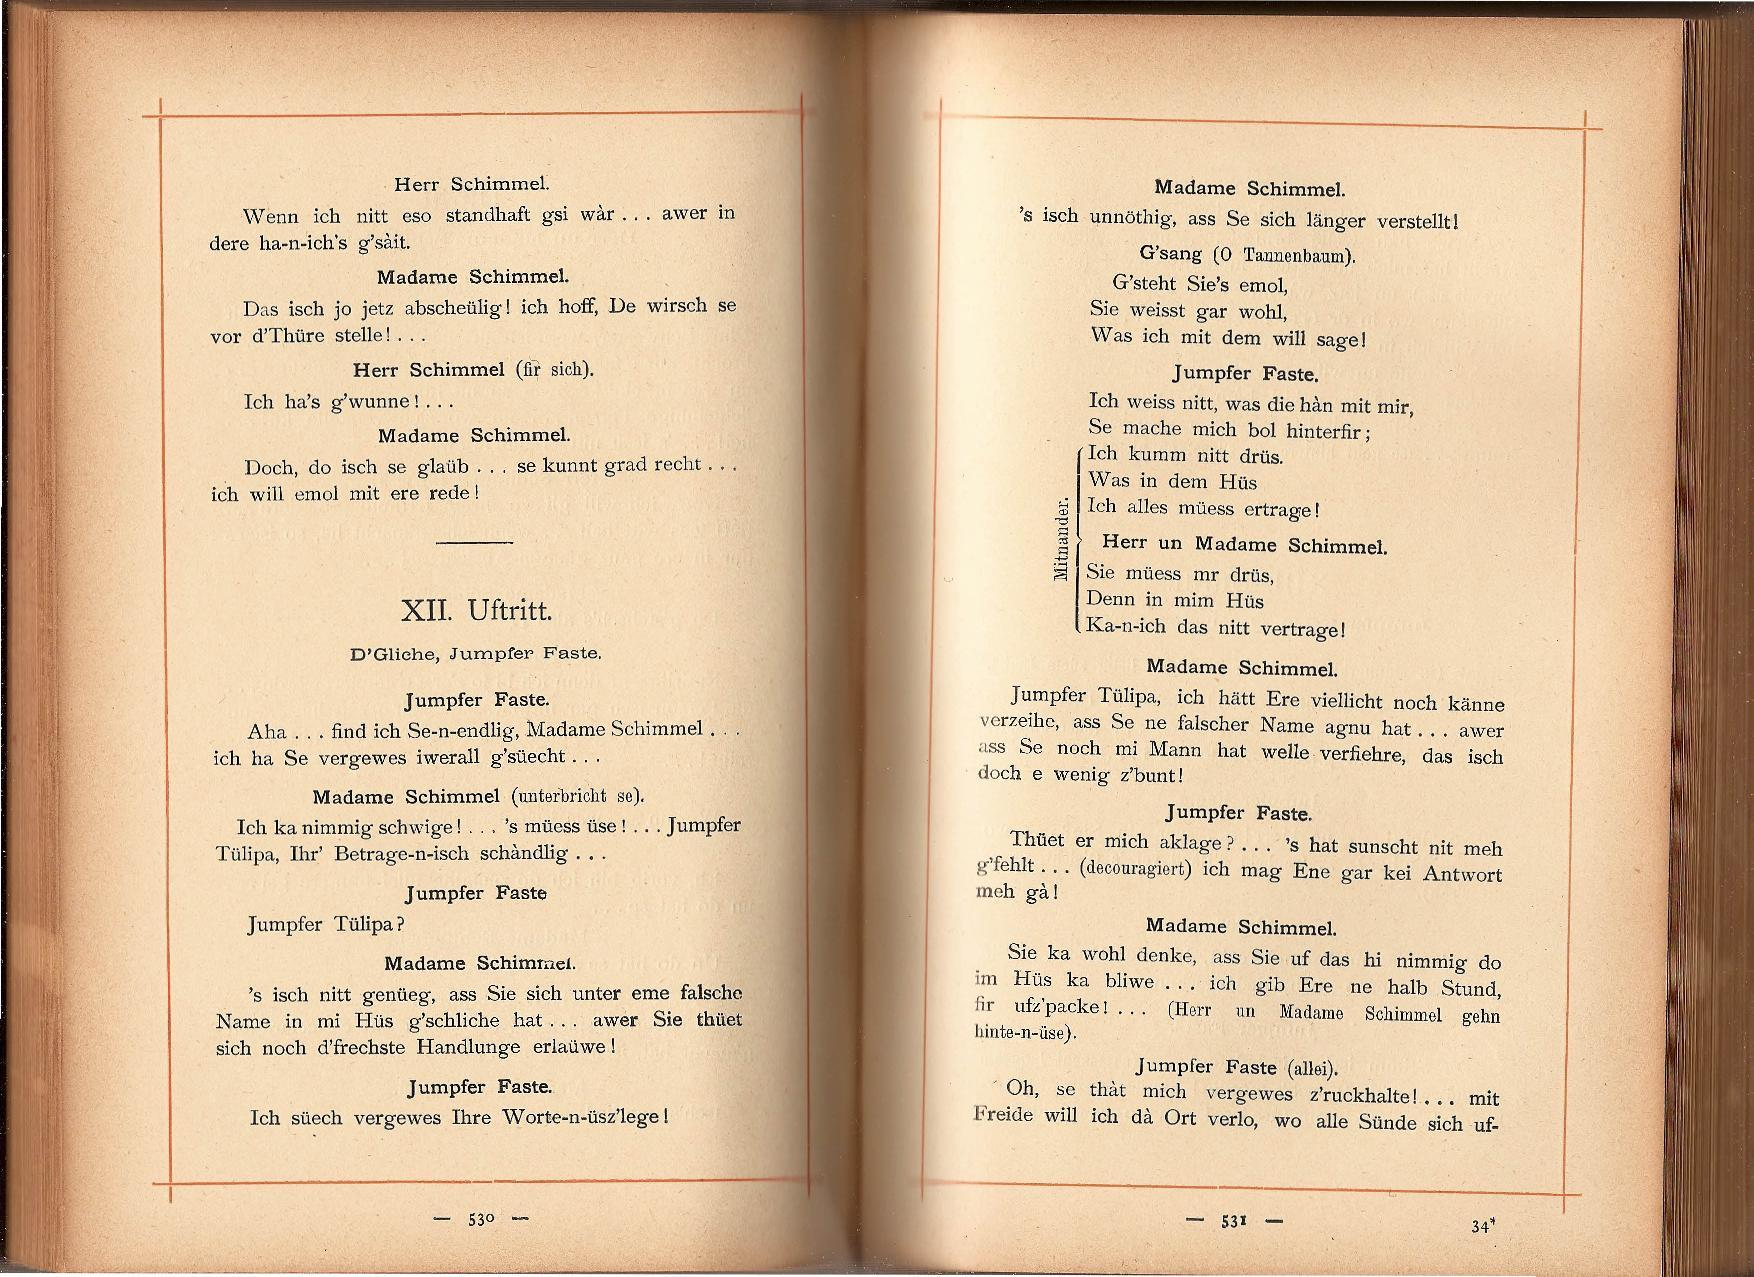 File:ALustig SämtlicheWerke ZweiterBand page530 531 pdf - Wikimedia